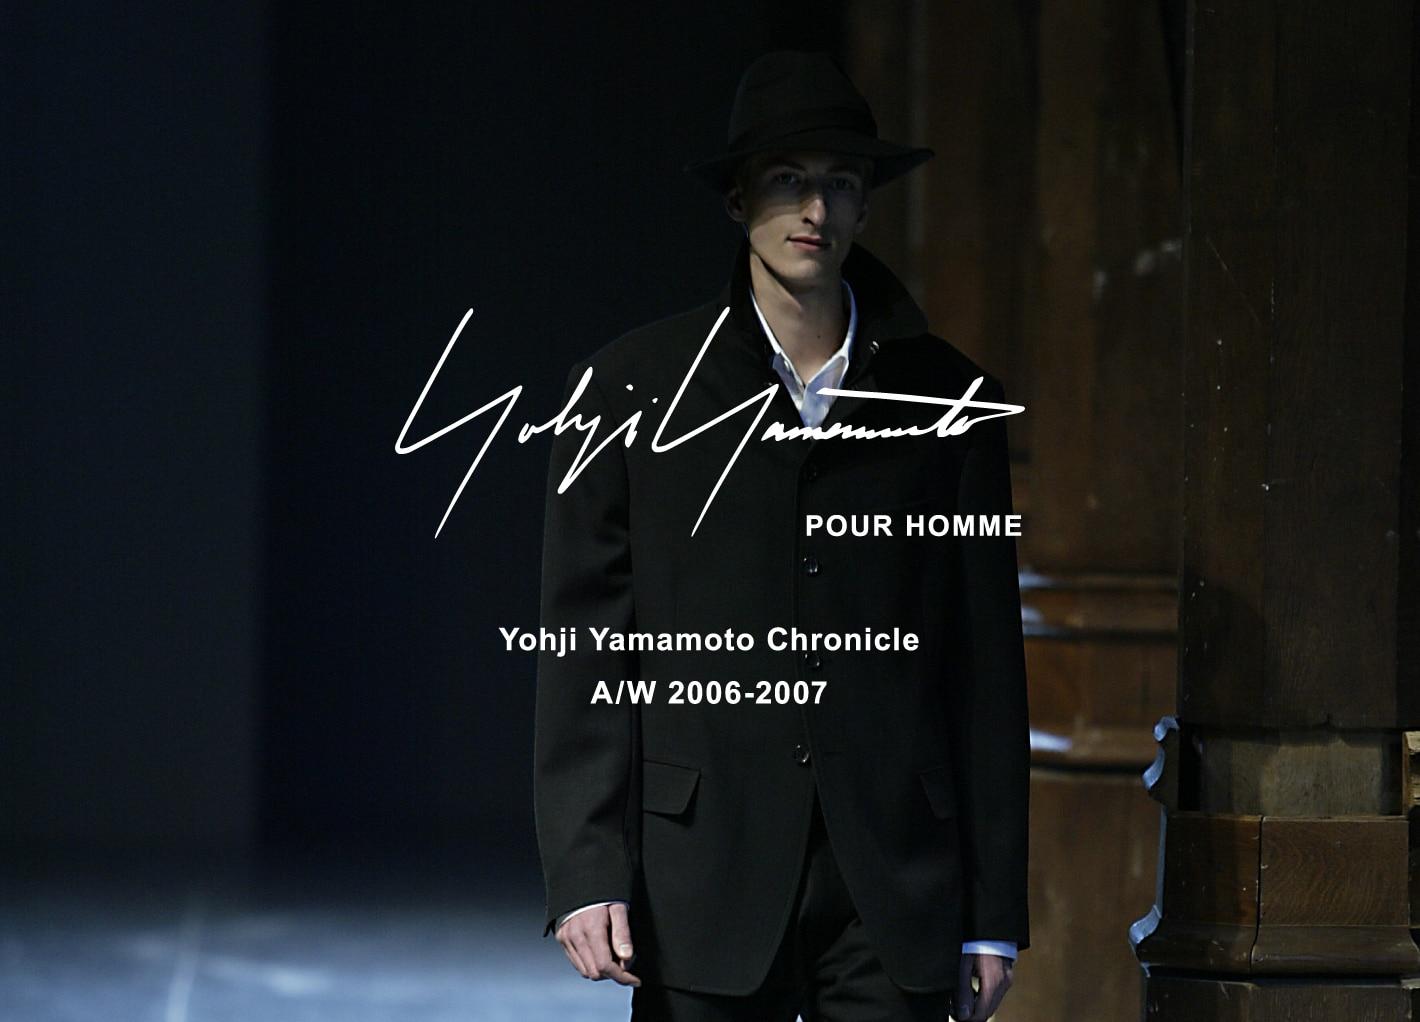 Yohji Yamamoto Chronicle – POUR HOMME AW 2006-2007